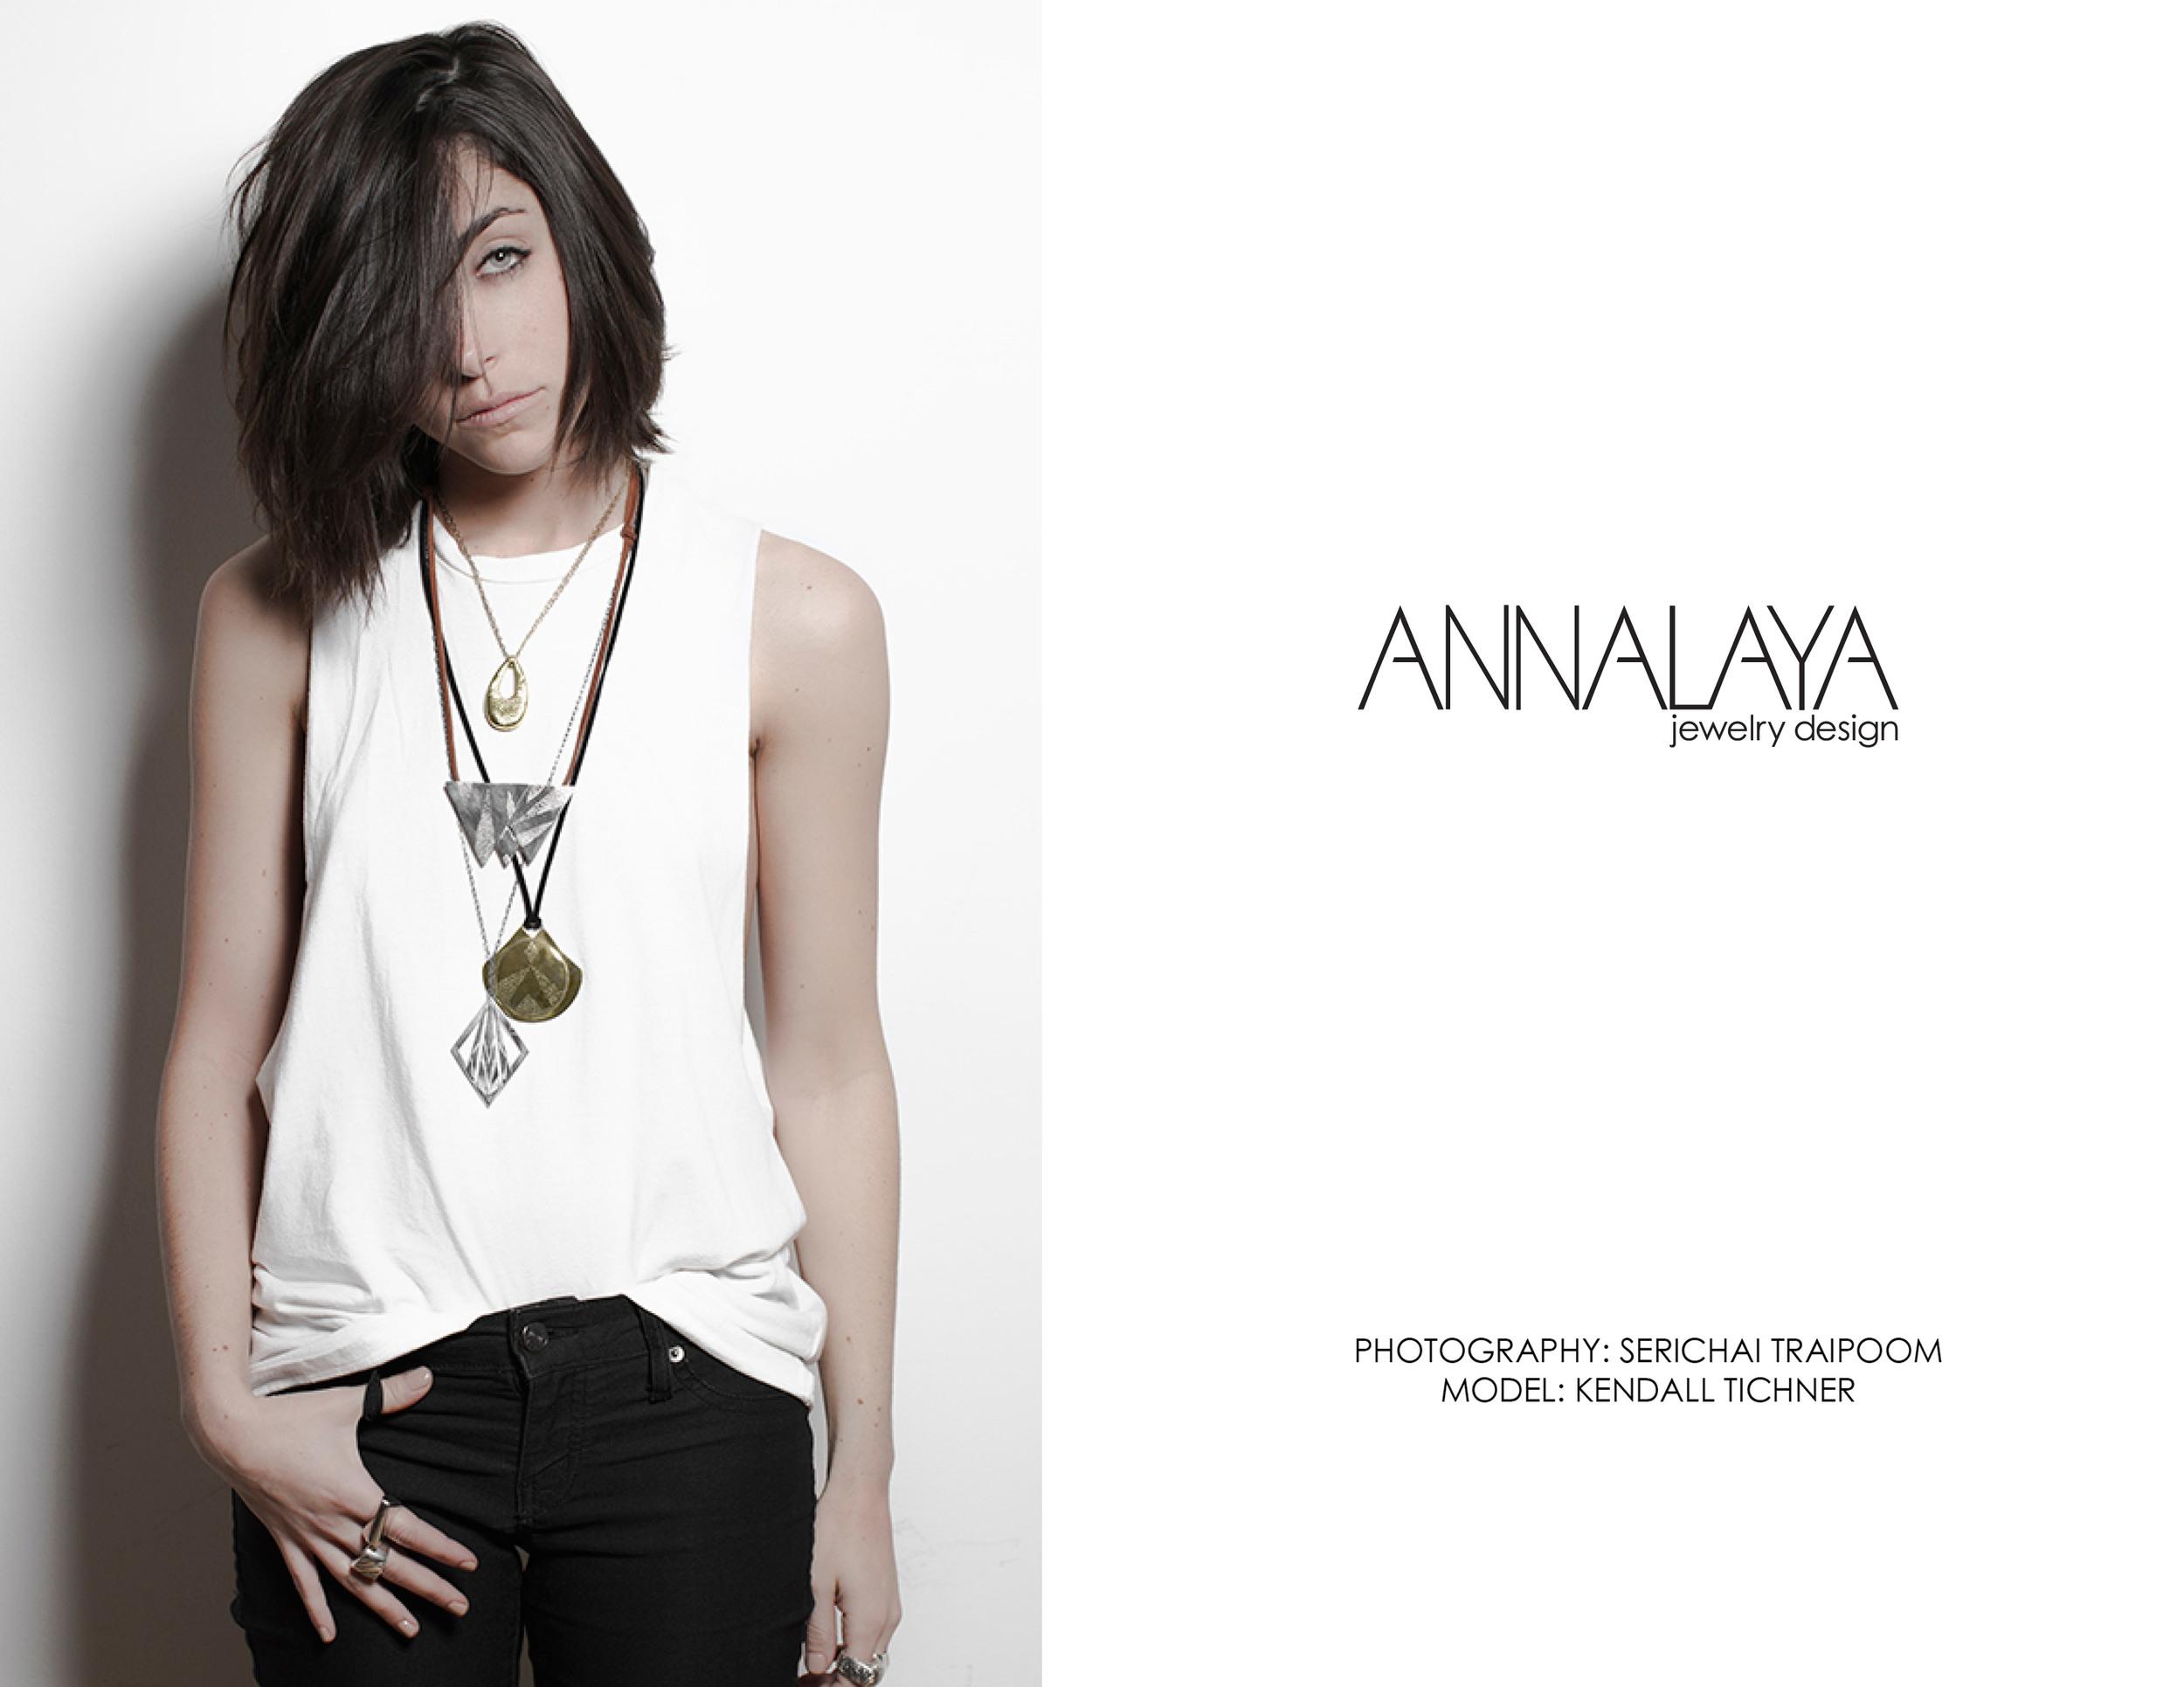 mailto:info@annalaya.com